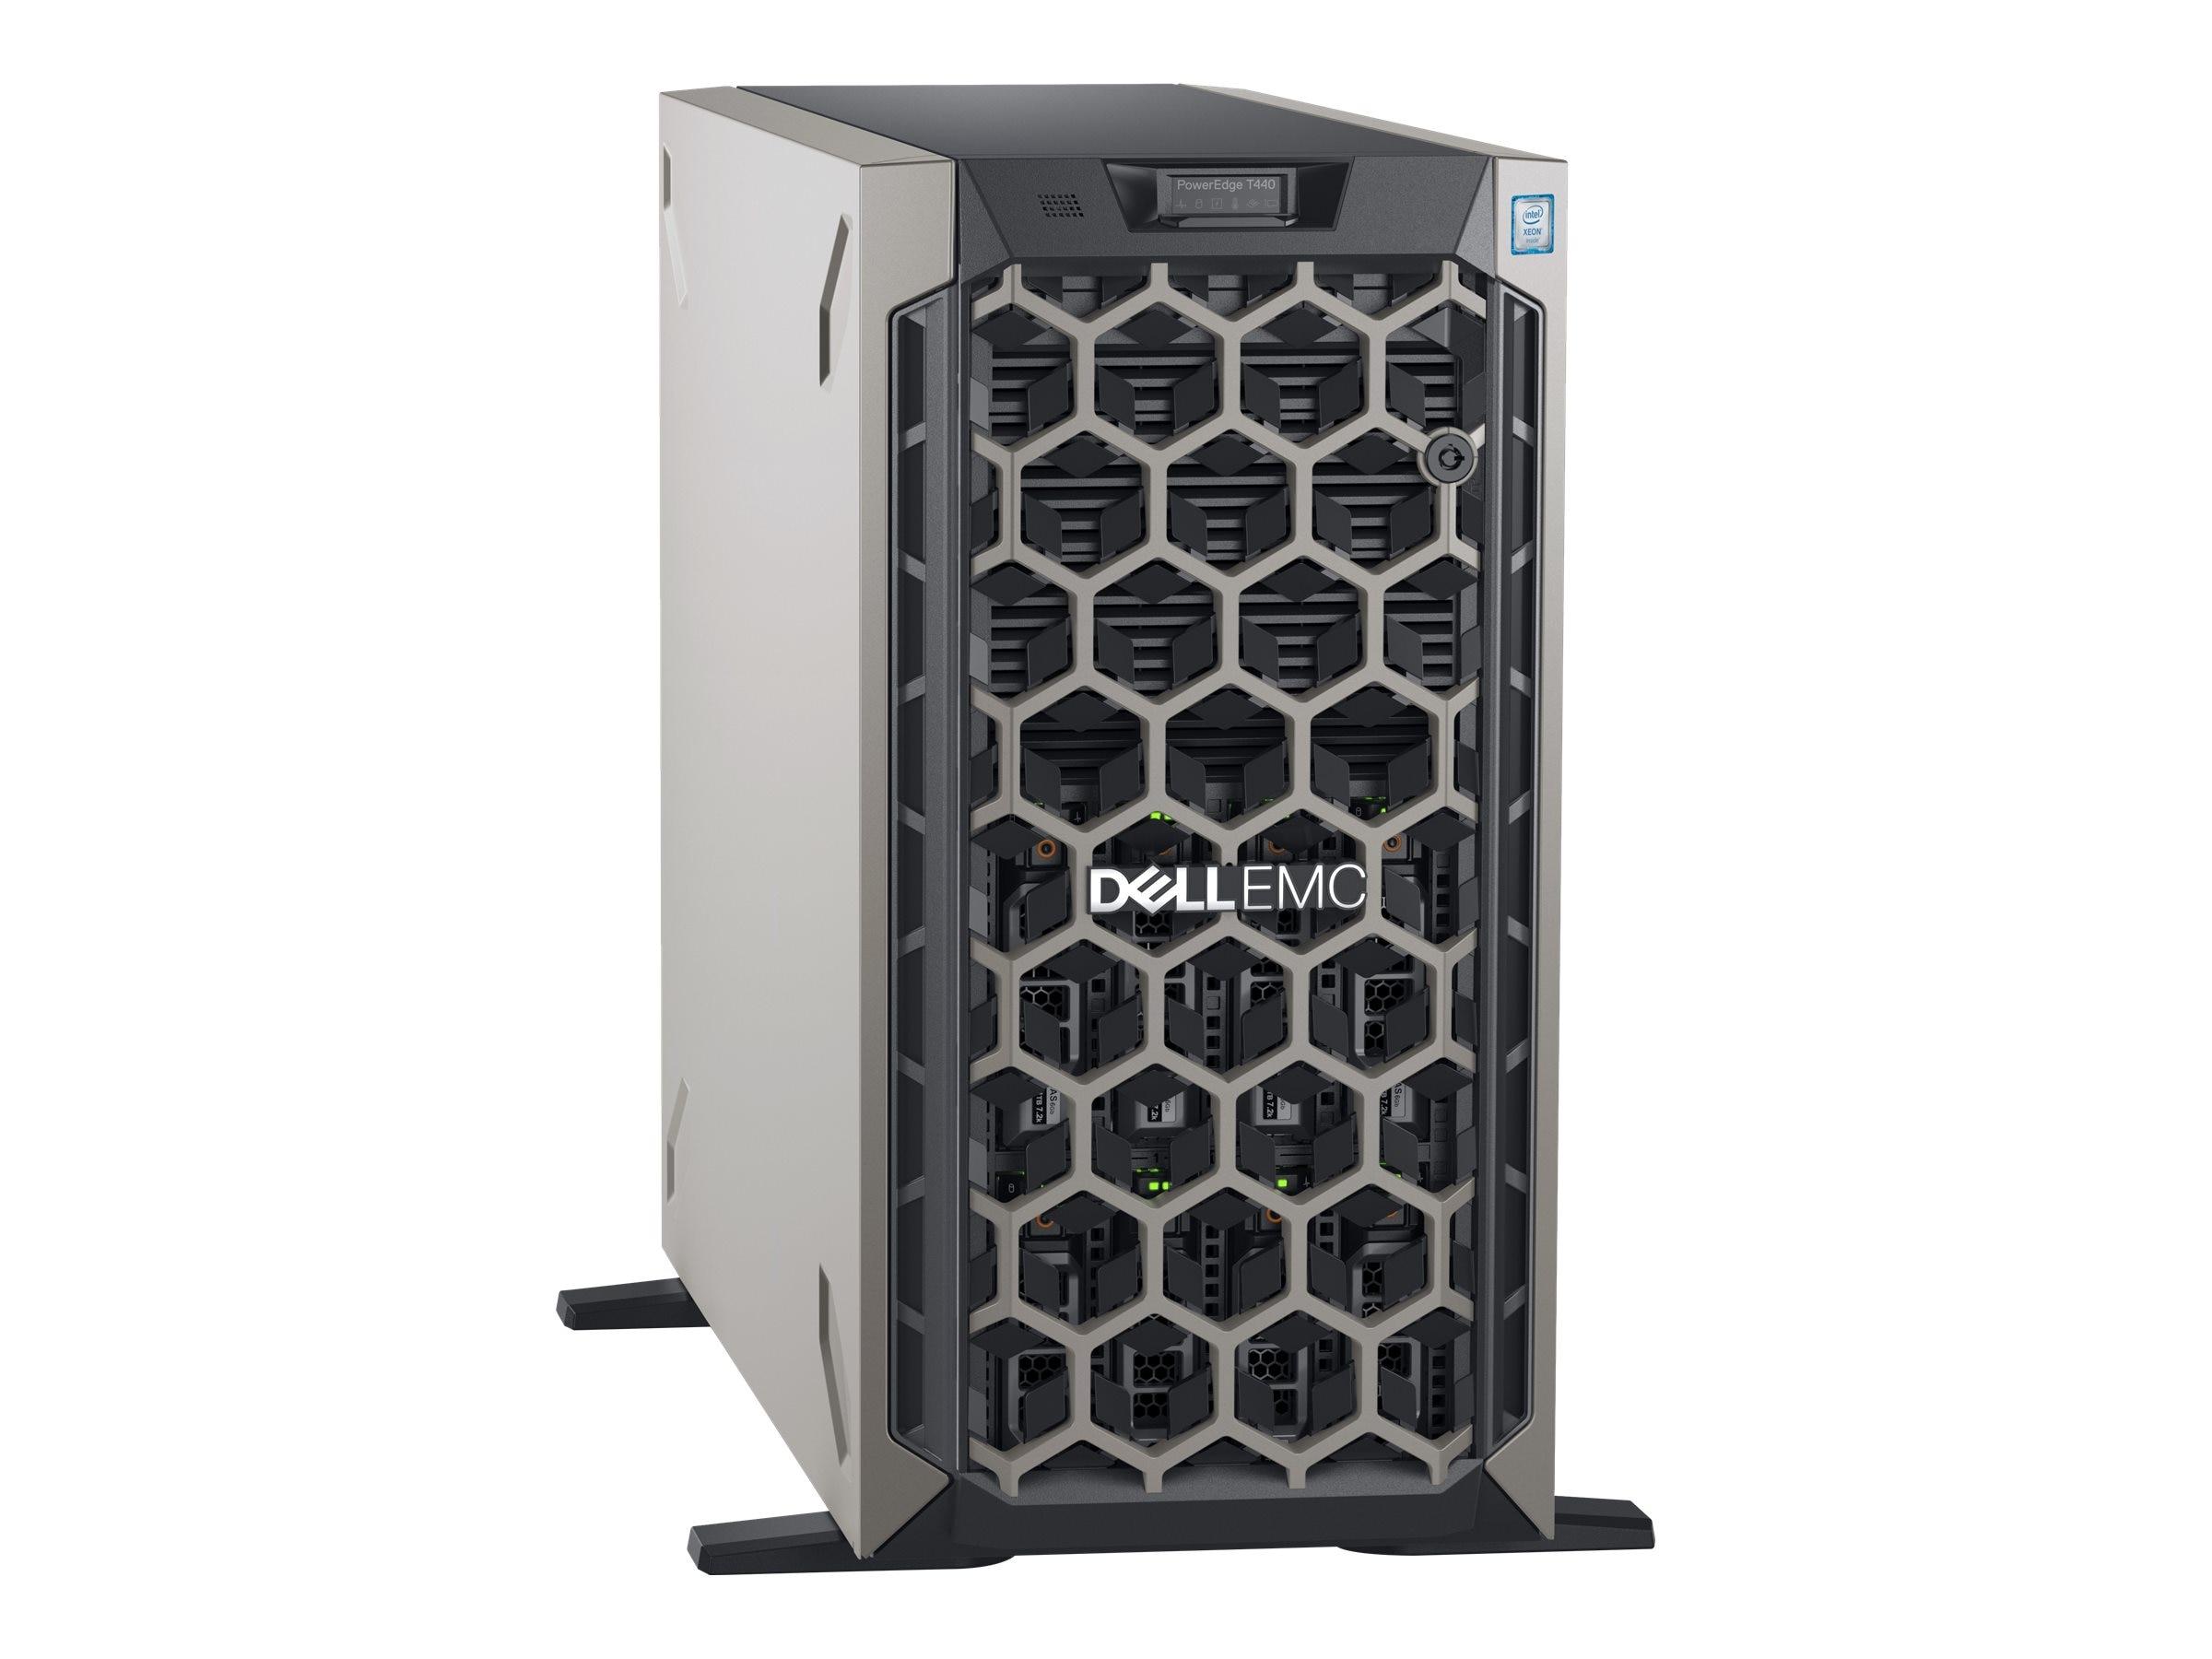 Dell PowerEdge T440 Intel 2 1GHz Xeon Silver